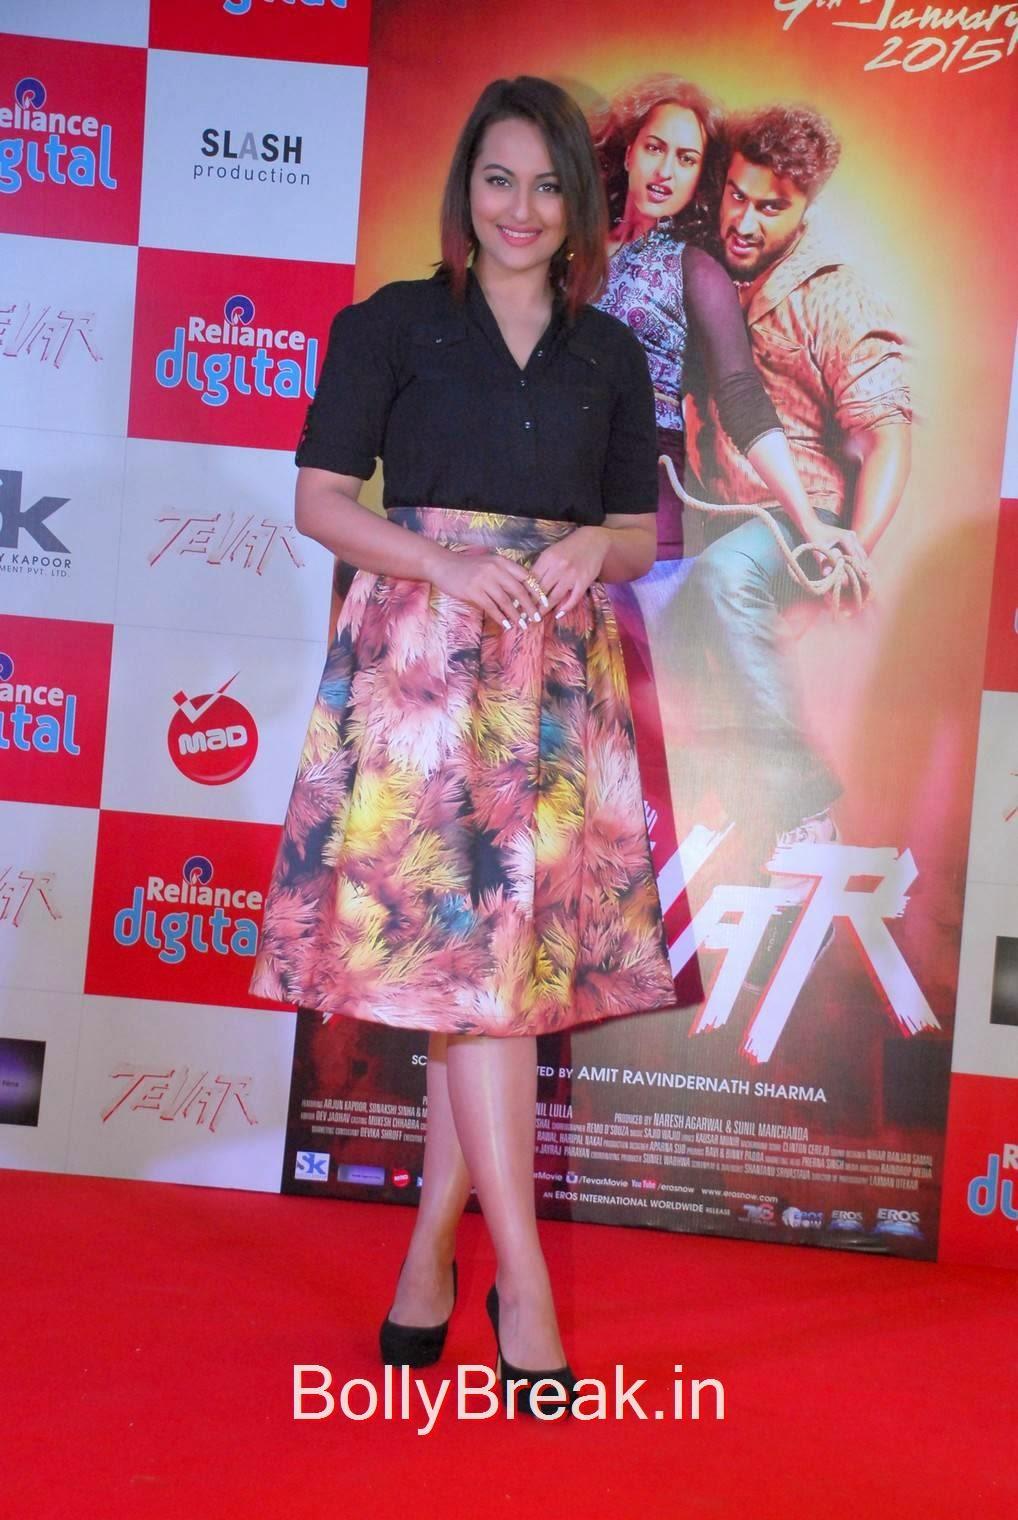 Sonakshi Sinha Pics, Sonakshi Sinha Hot Pics In Skirt At Reliance Digital Infiniti Mall 2 Malad